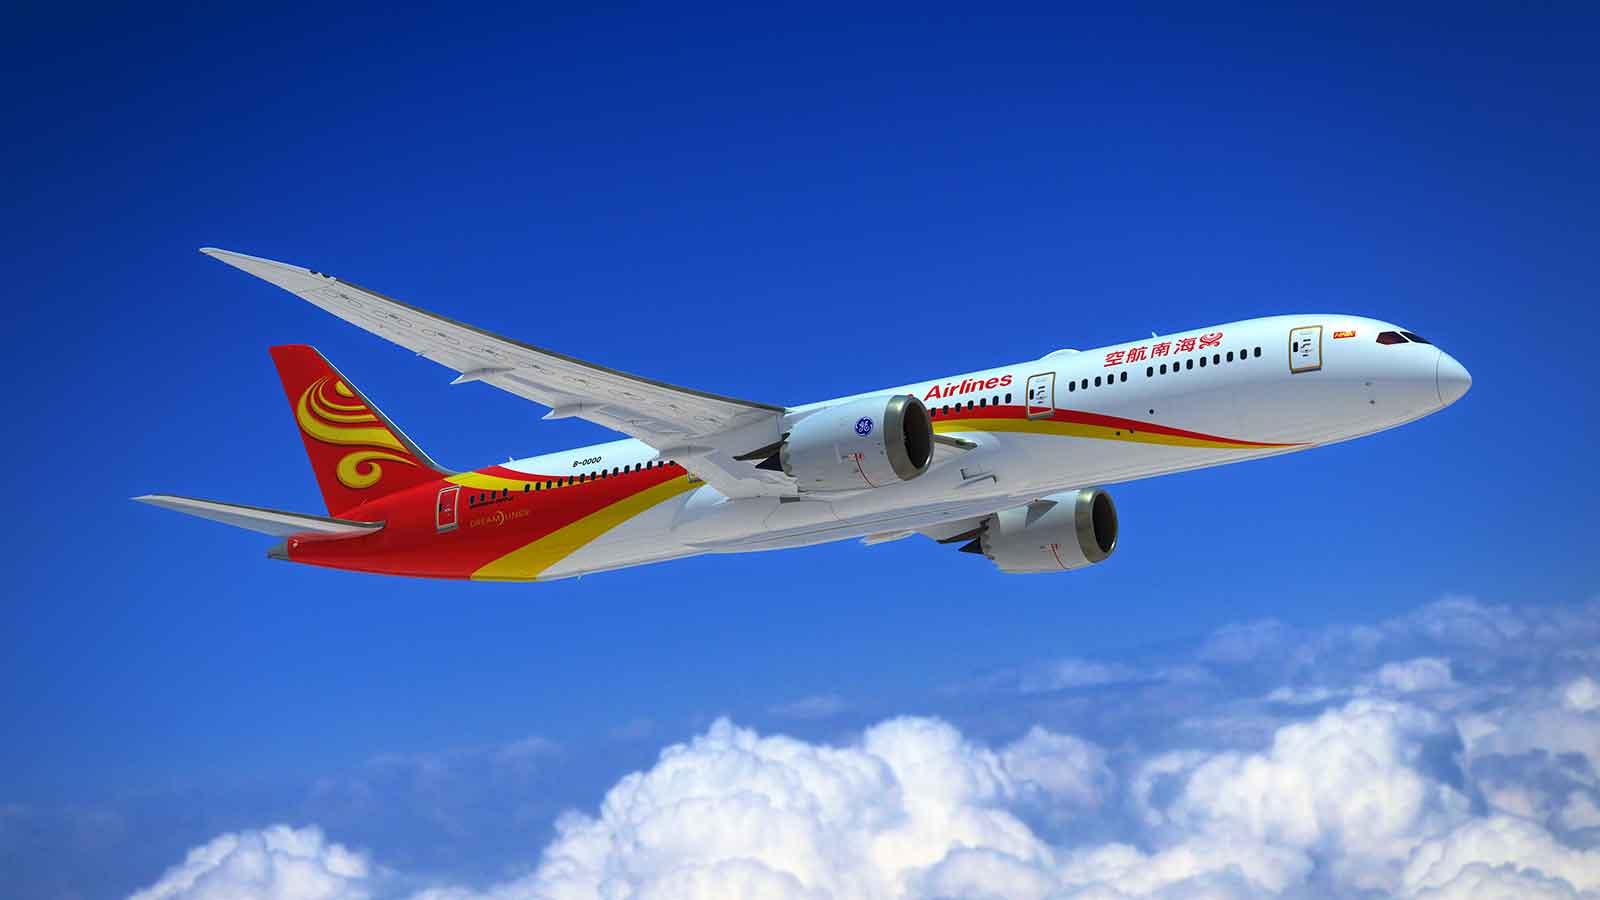 Hainan Airlines Boeing 787-9 Dreamliner